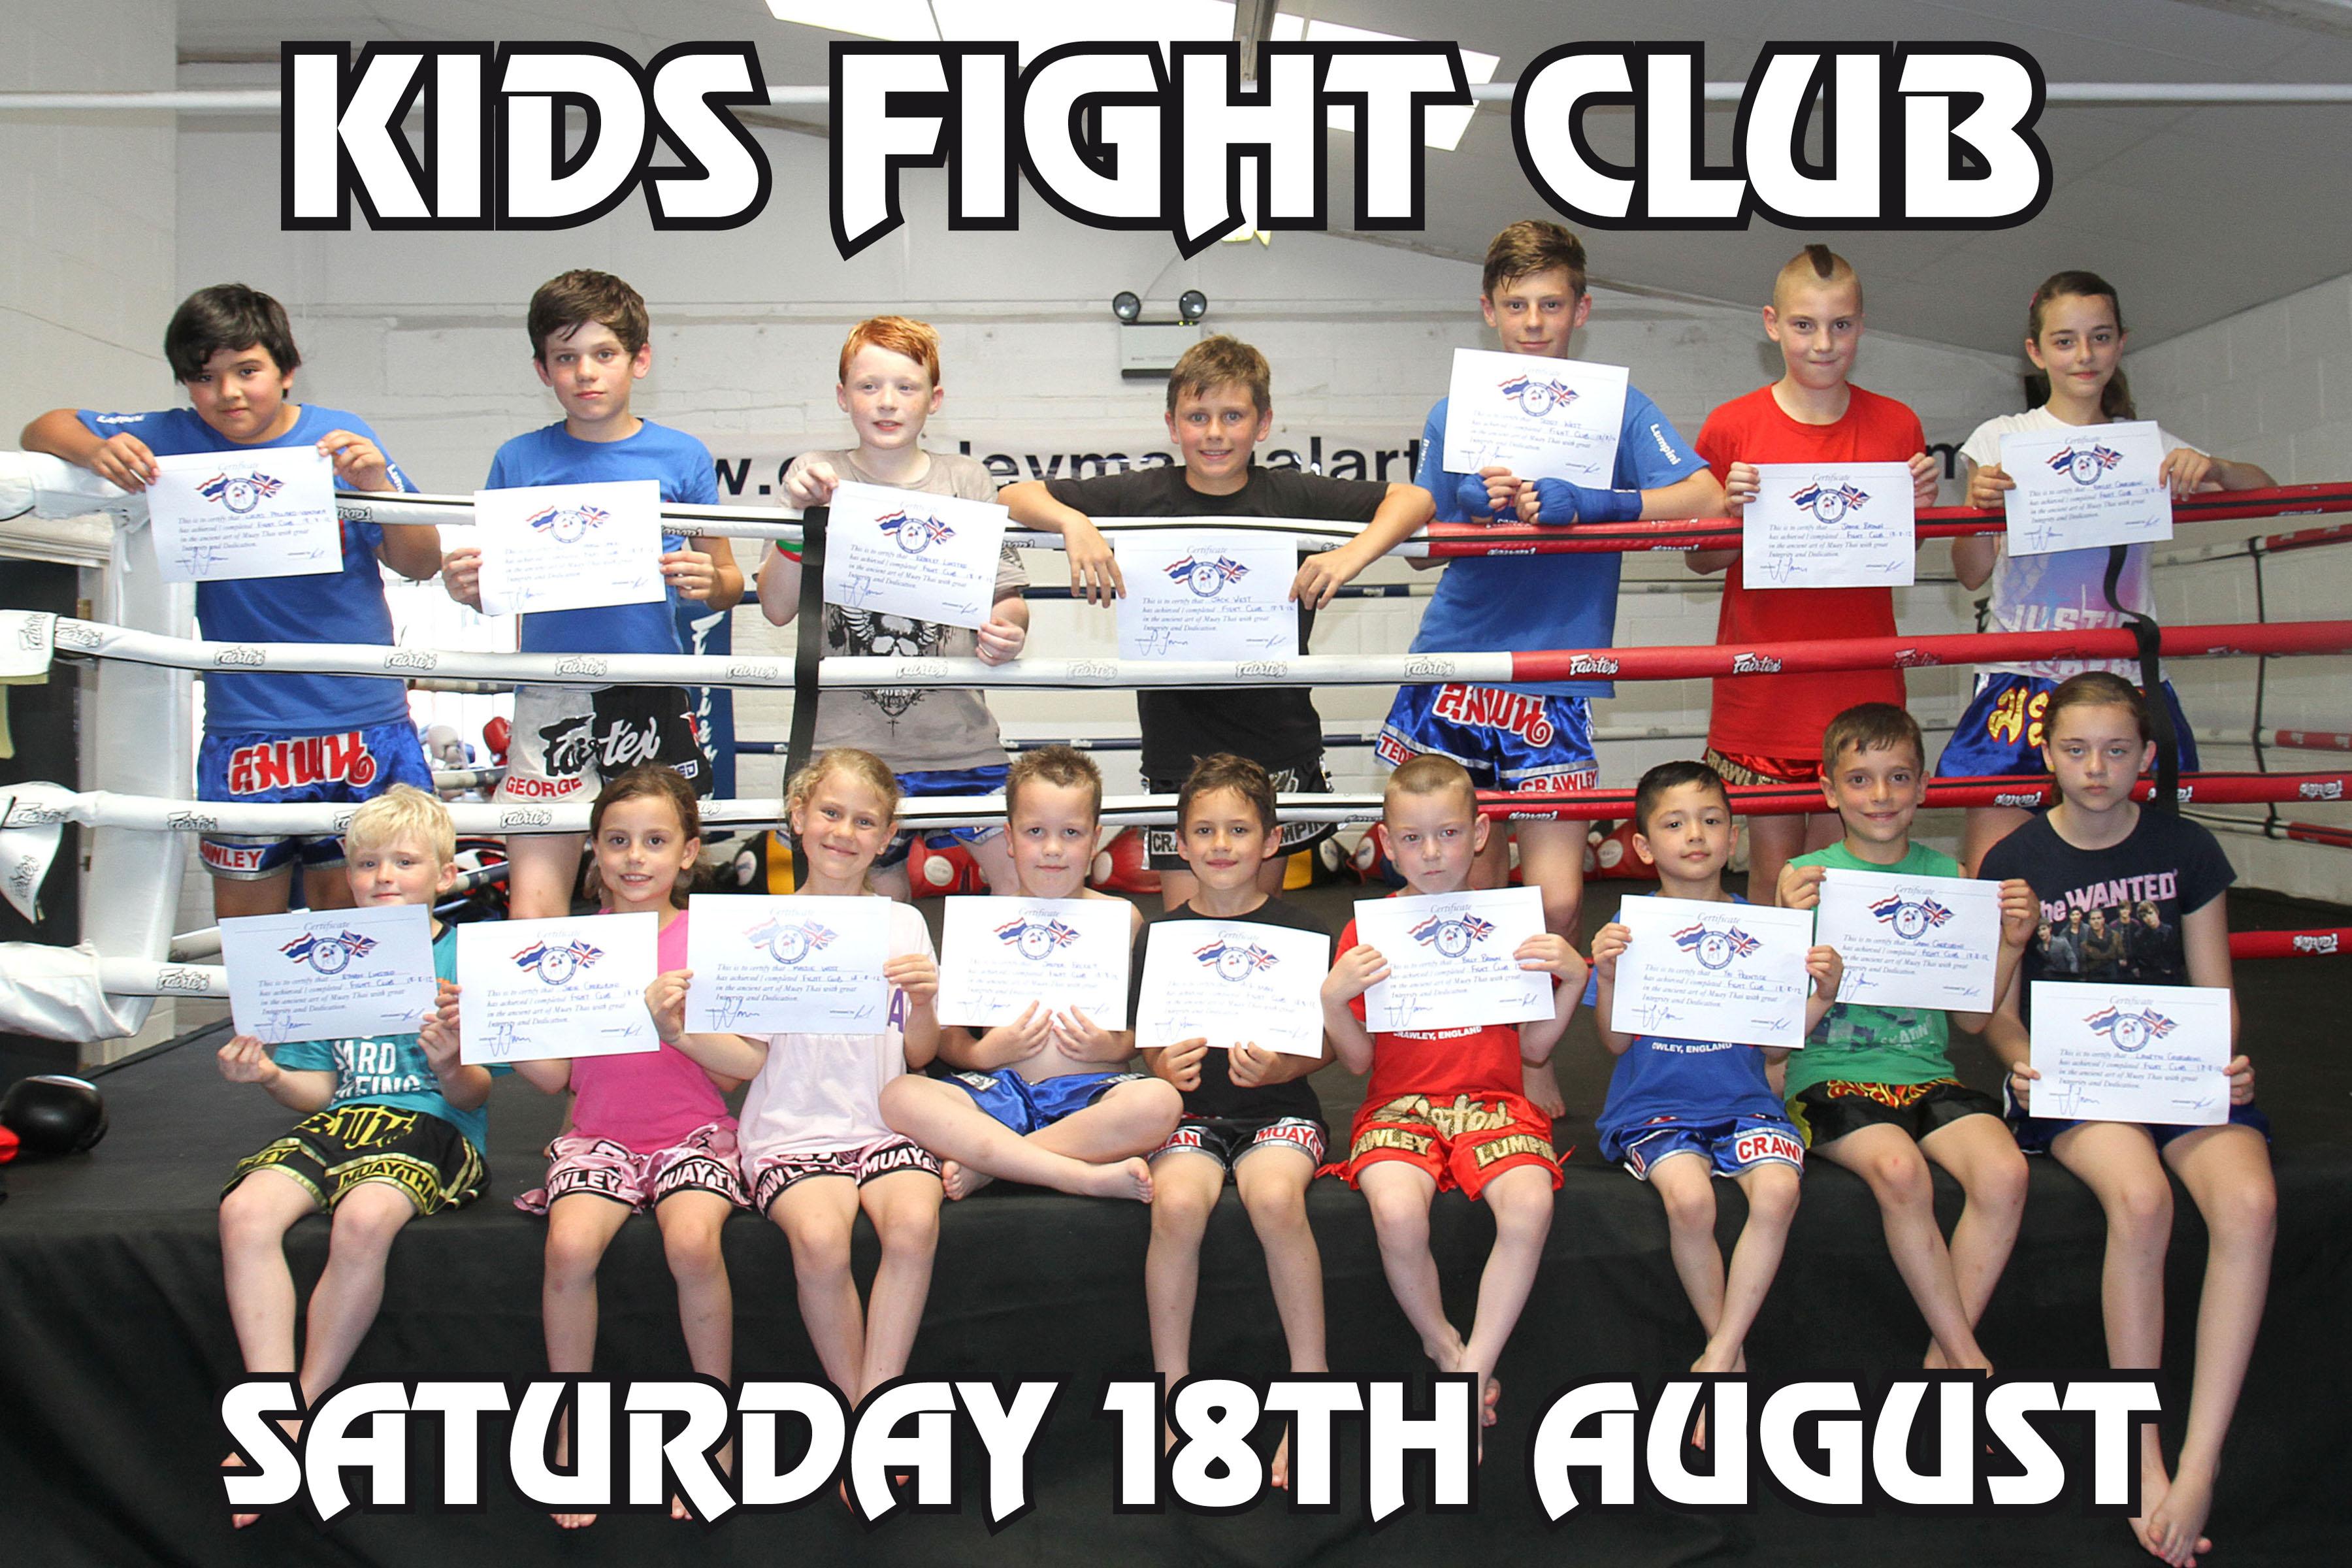 Kids Fight Club Crawley Fitness